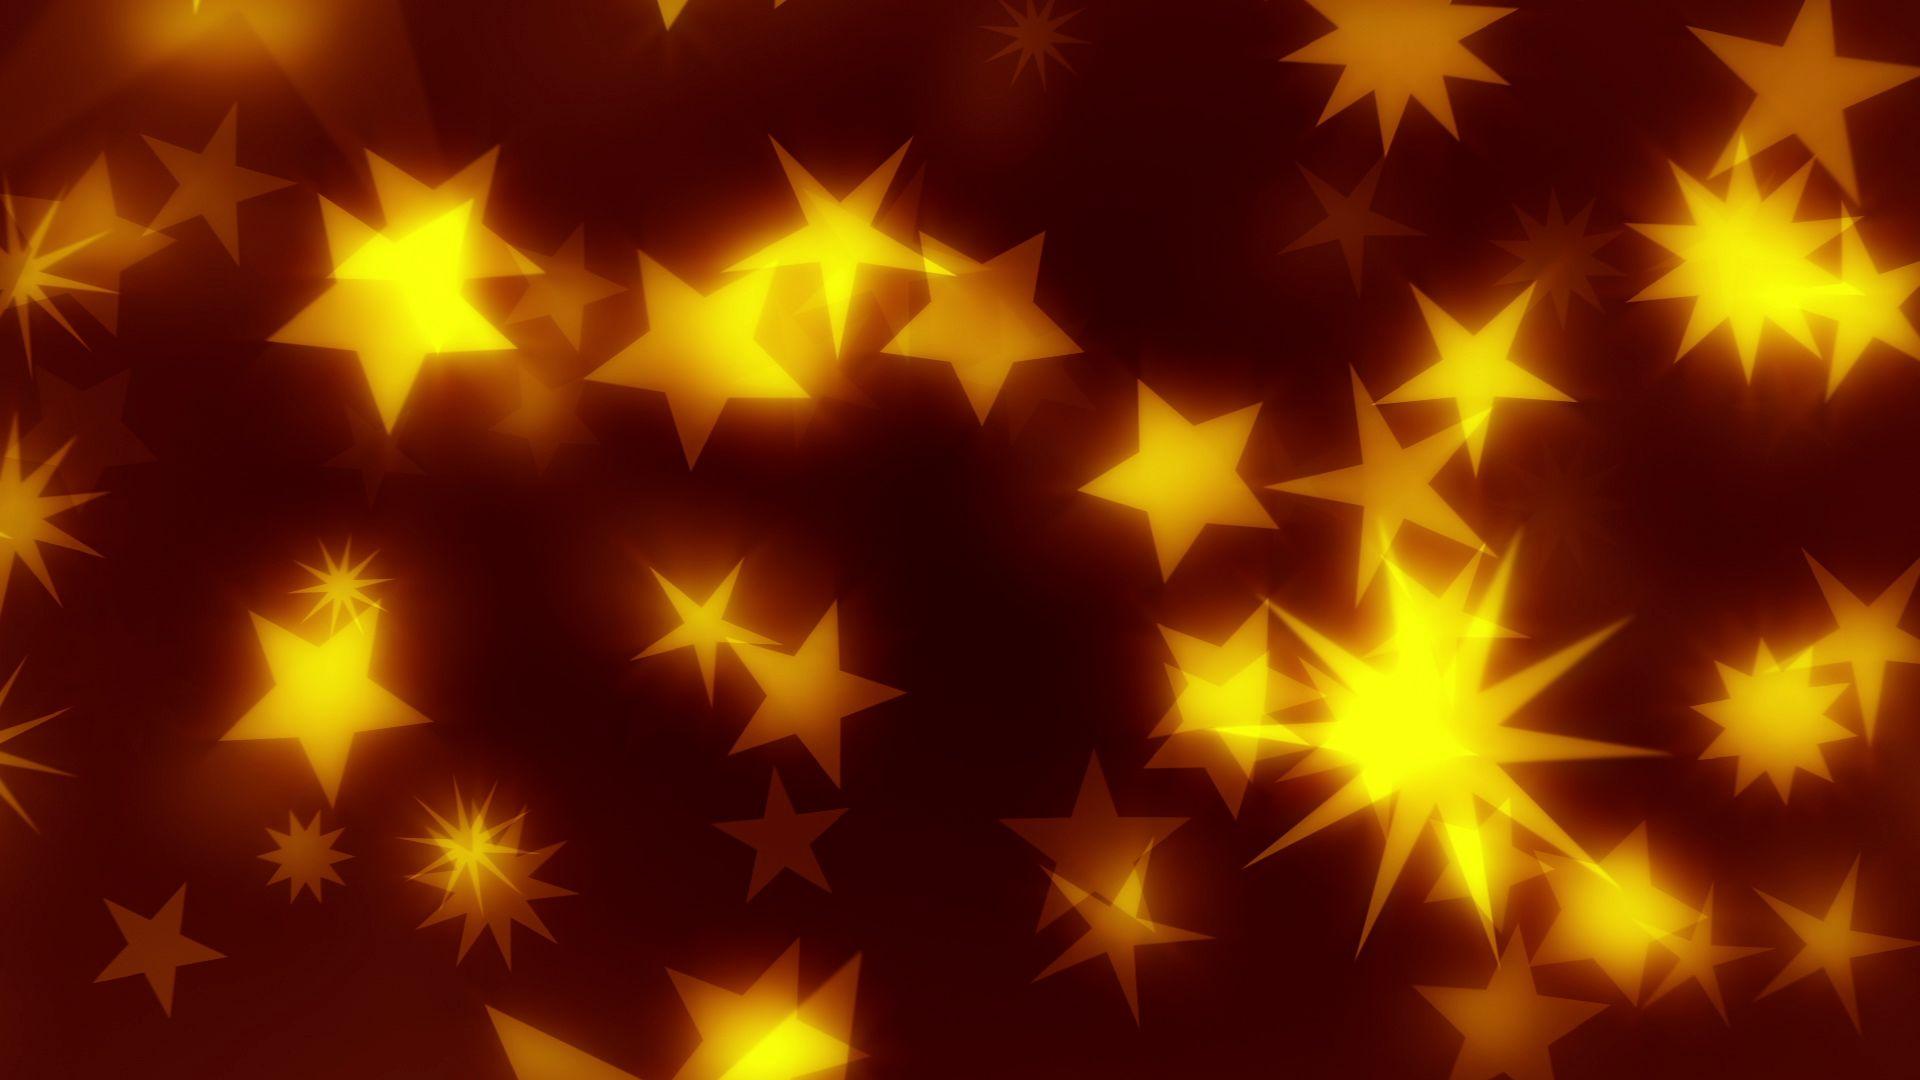 christars star and christmas motion background loop_sample3 - Christmas Motion Lights